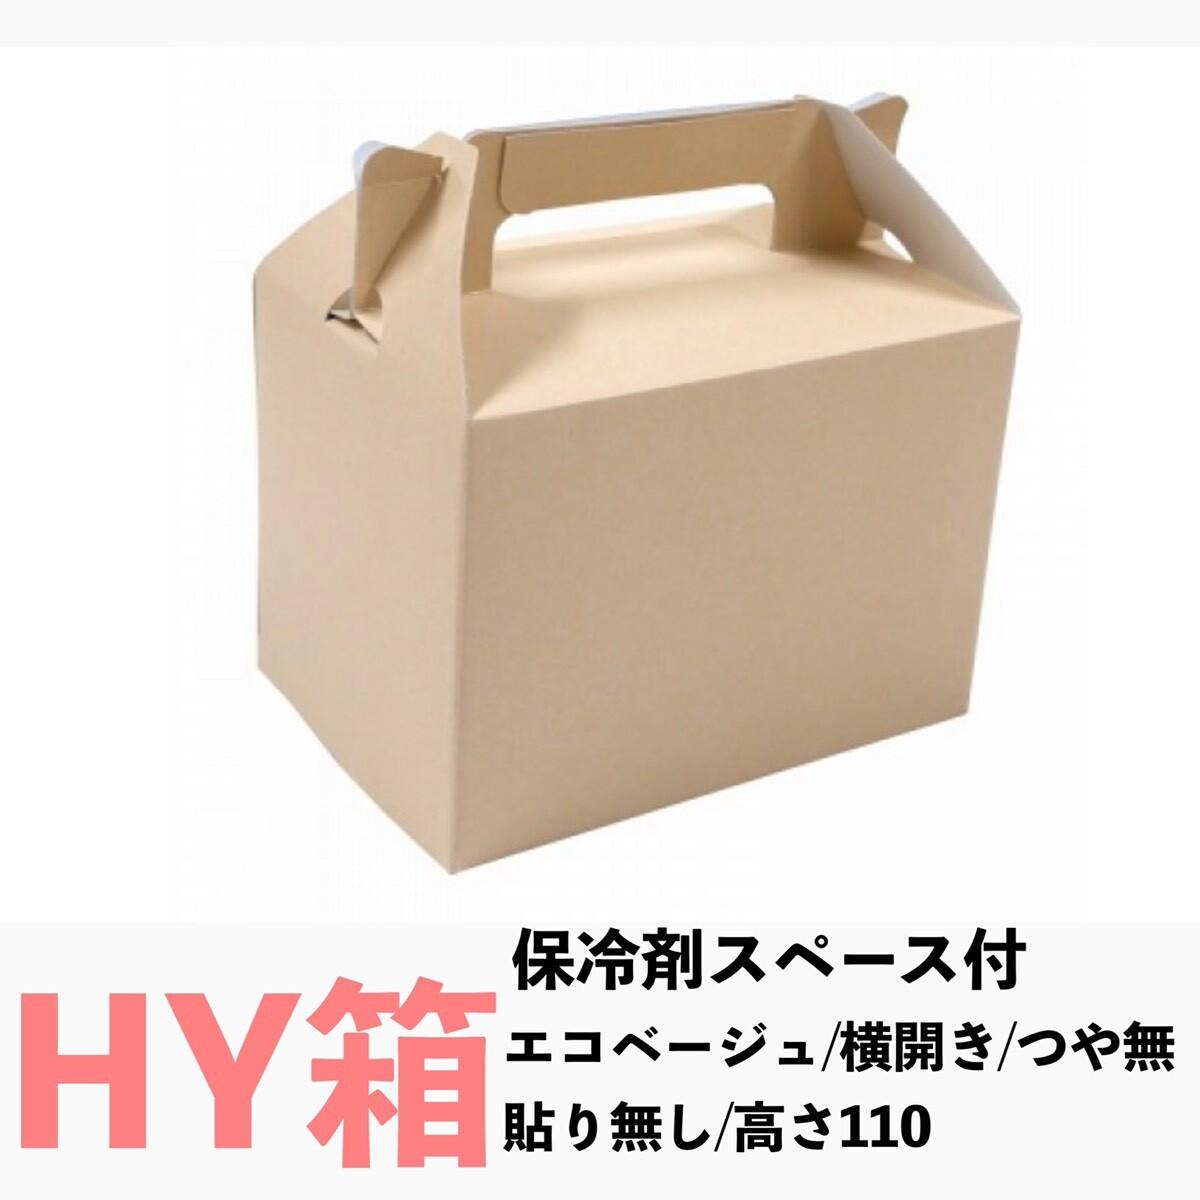 画像1: 【NEW】C-エコ-HY 2HY/4HY/6HY/8YH@1枚20〜44円 (1)